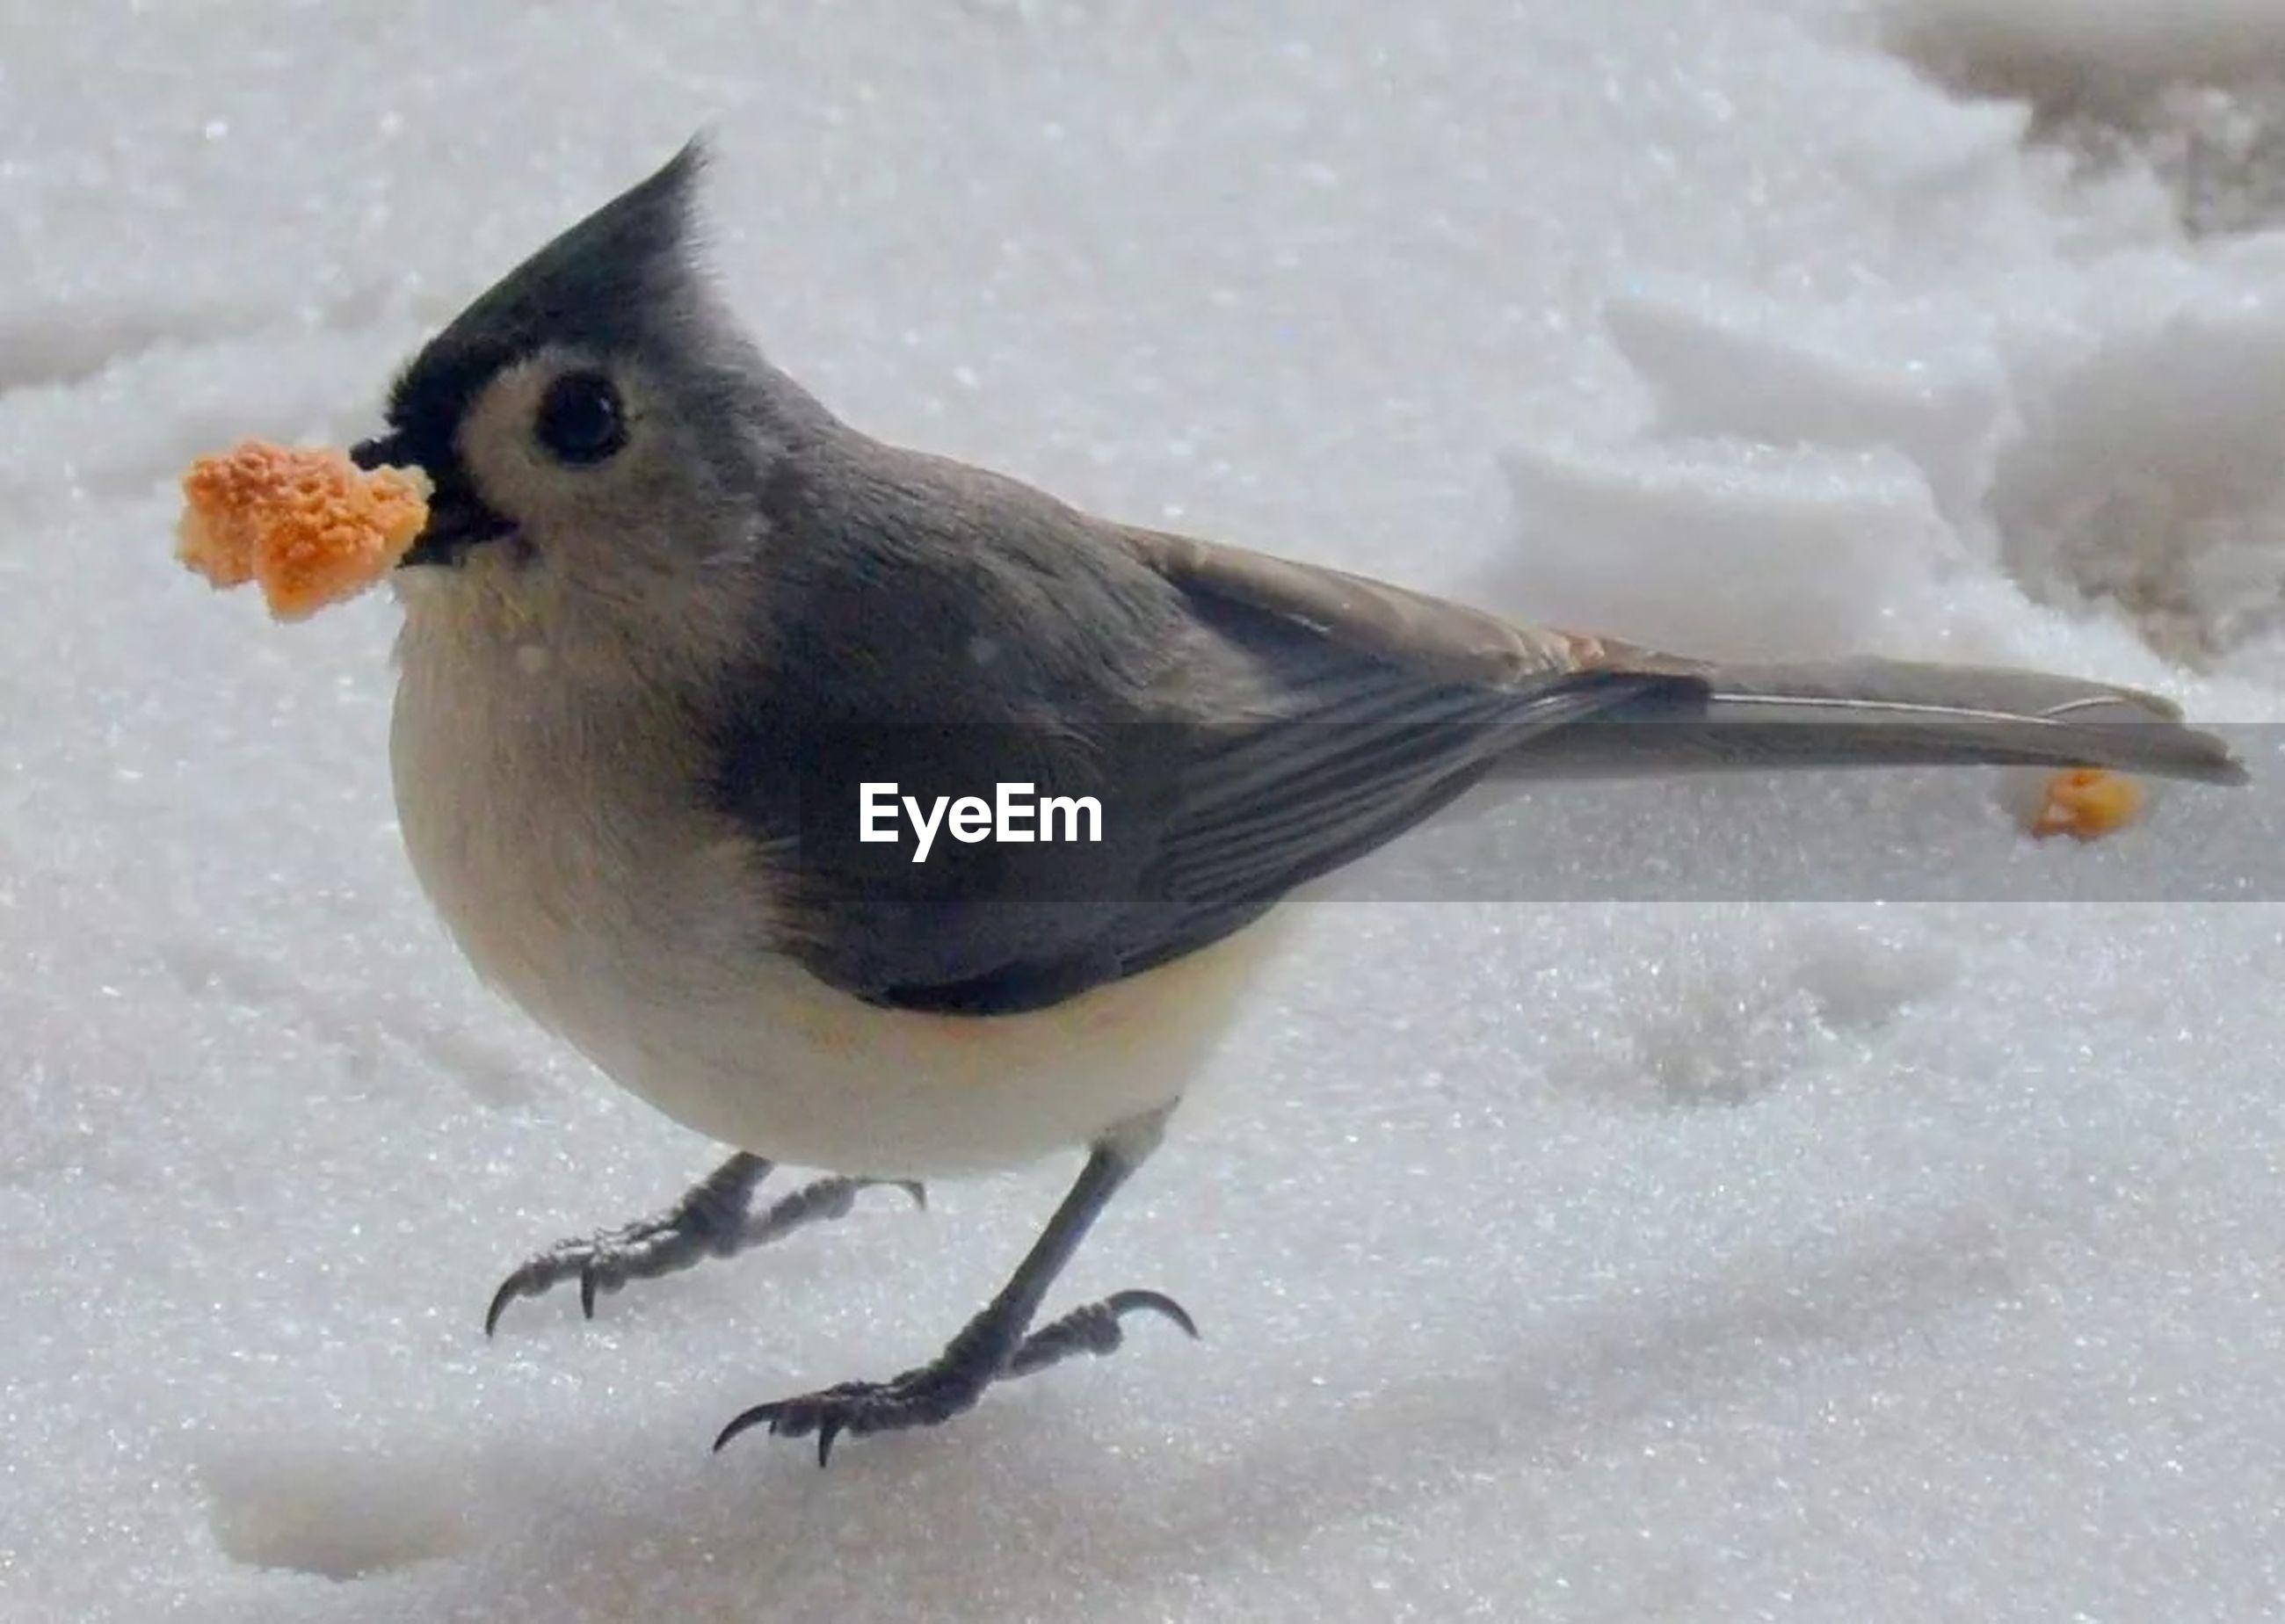 Close-up of bird feeding